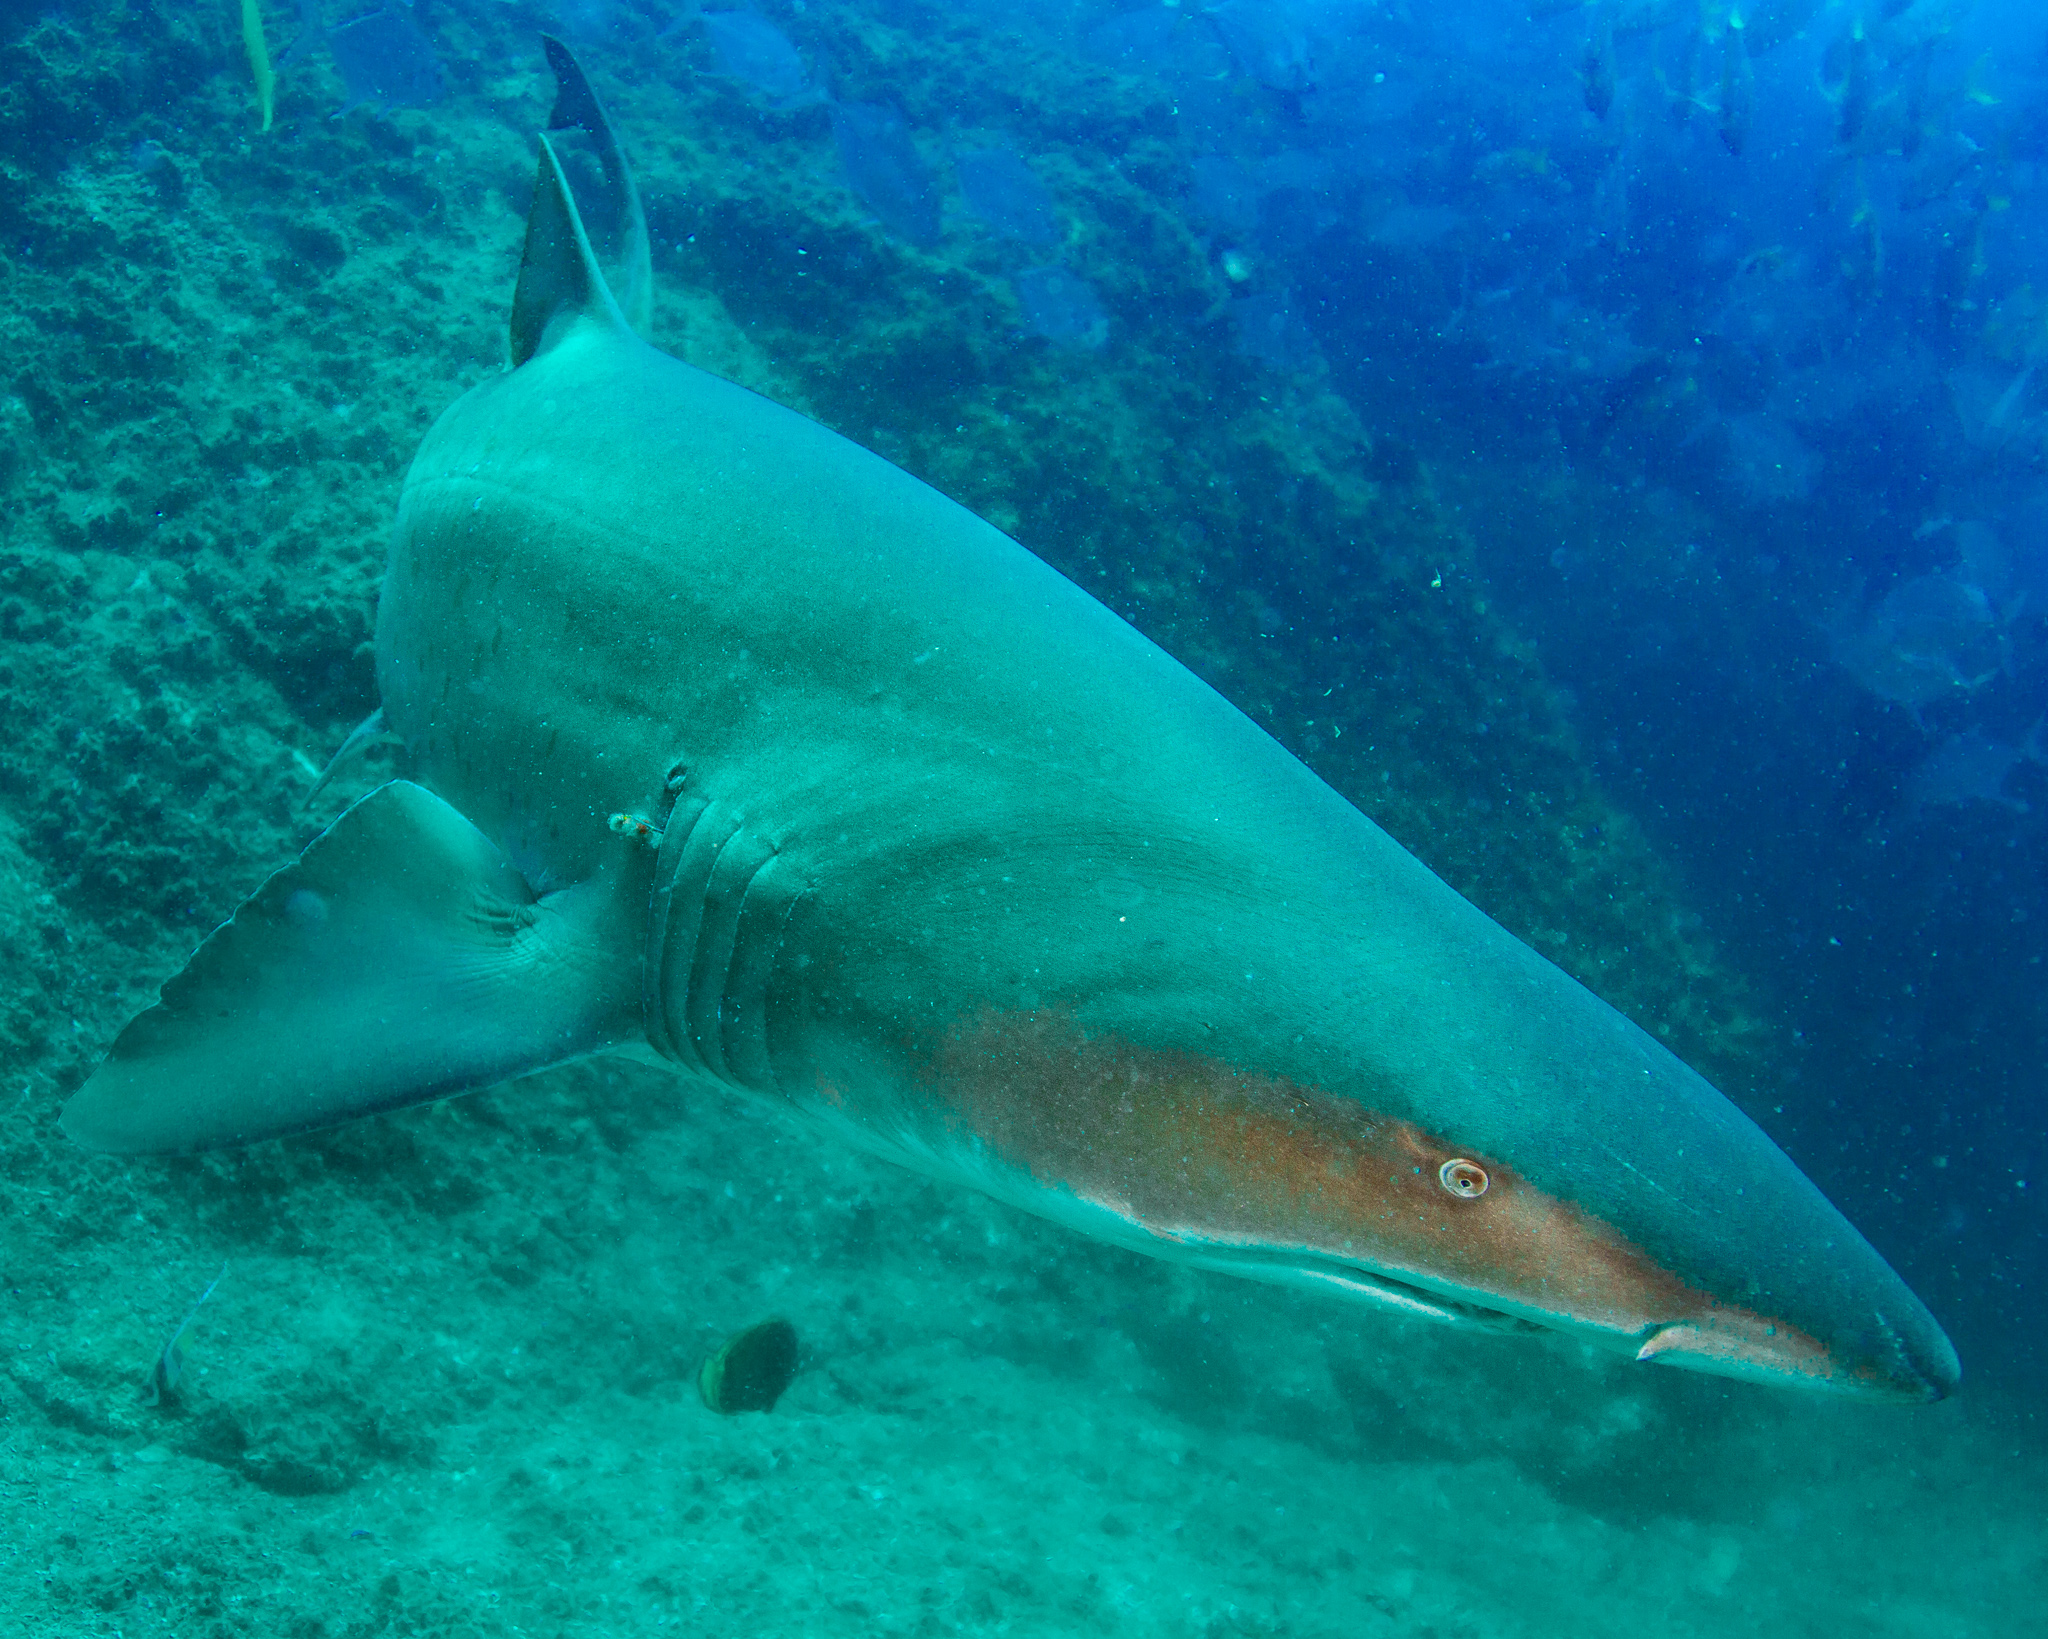 Scuba Diving Grey Nurse Shark Queensland Australia